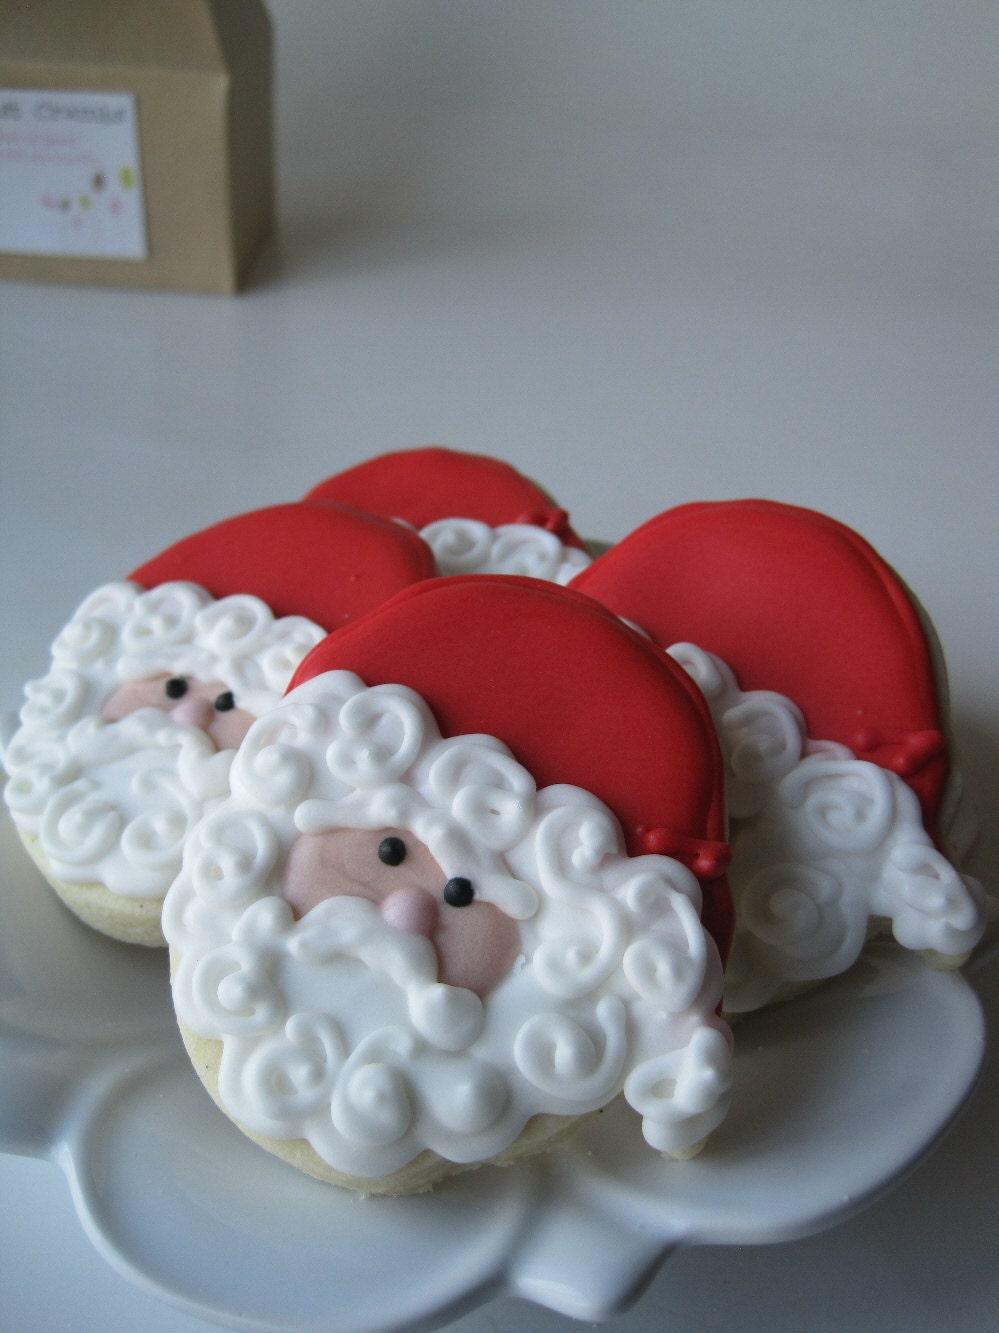 SANTA Klaus sugar cookies - 1 dozen